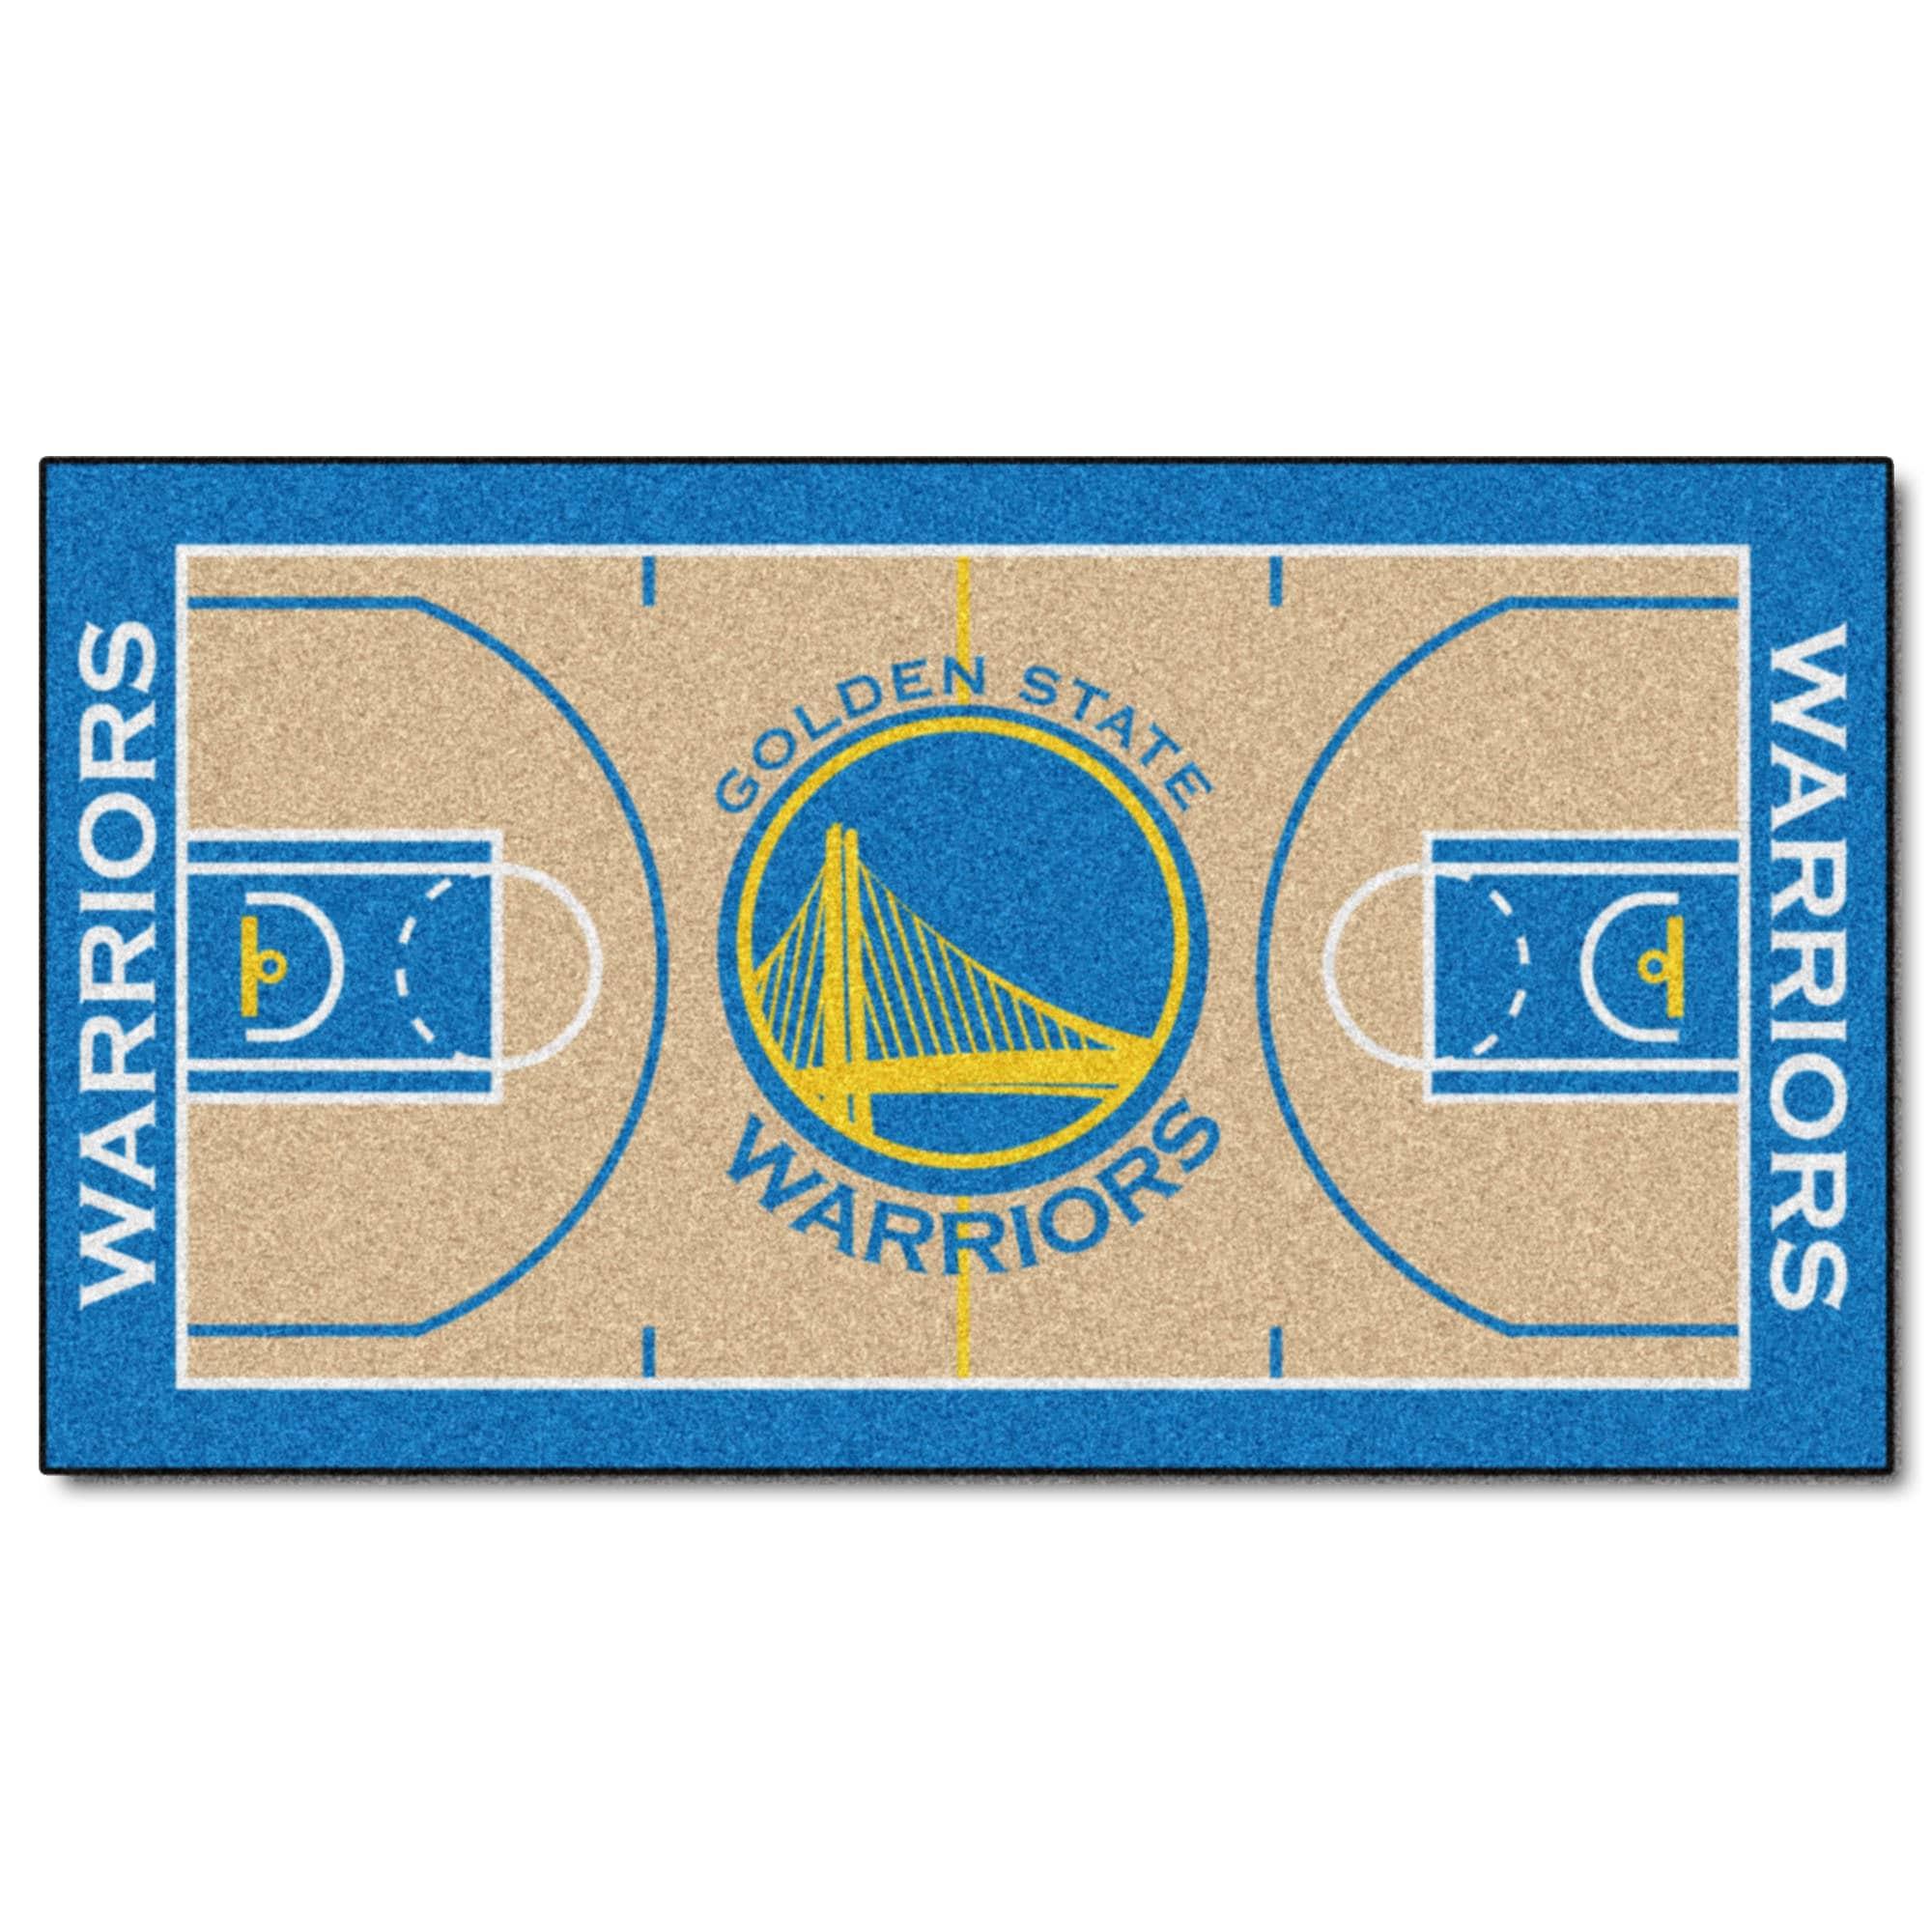 Fan Mats Machine-made Golden State Warriors Tan Nylon Cou...